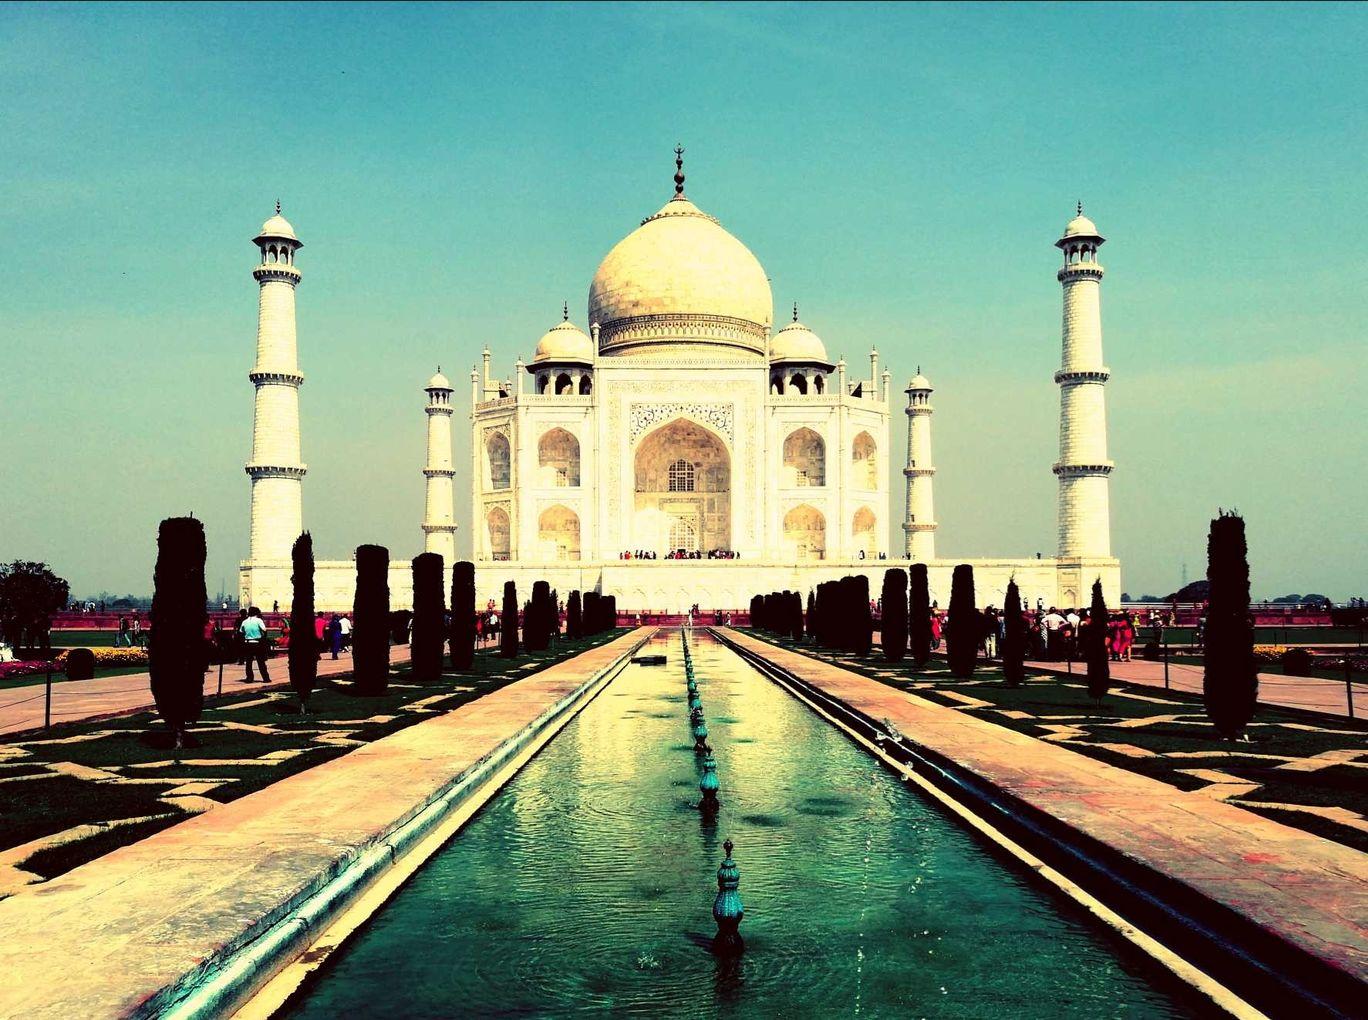 Photo of Taj Mahal By Bikramjit Sethi